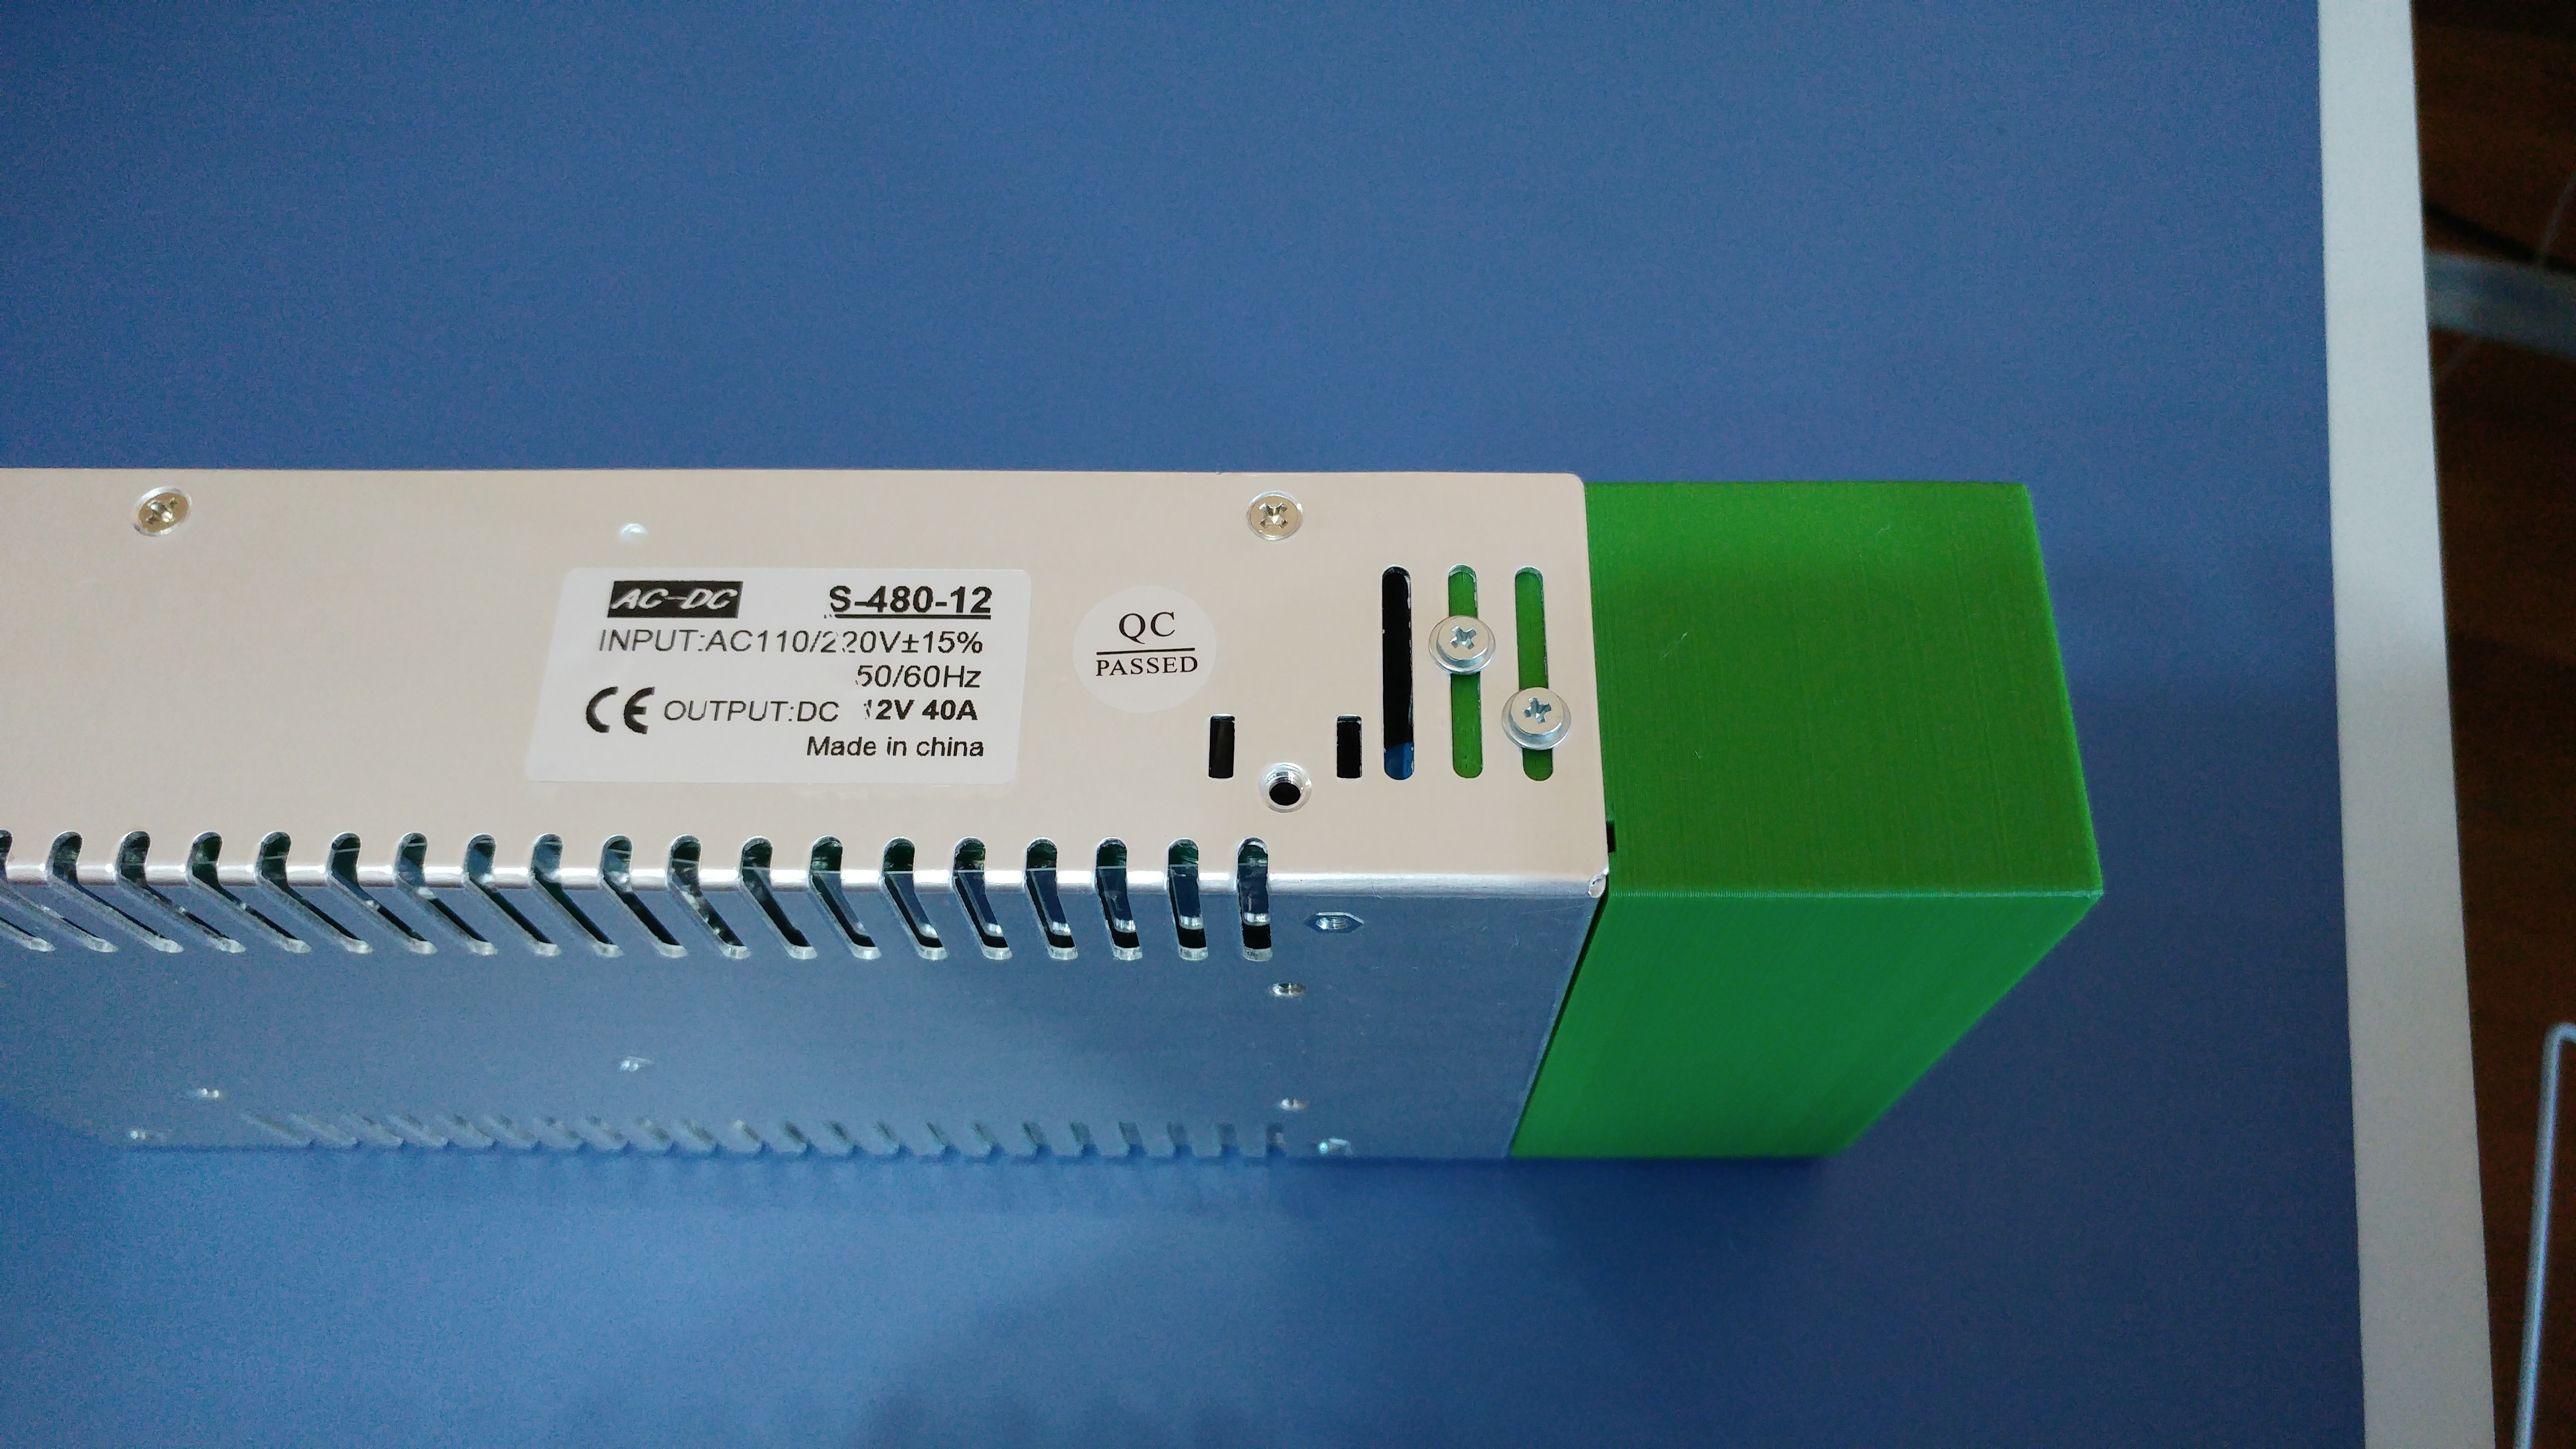 20190816_125249.jpg Télécharger fichier STL gratuit Carcasa Fuente de Alimentación con interruptor de encendido • Plan pour imprimante 3D, celtarra12